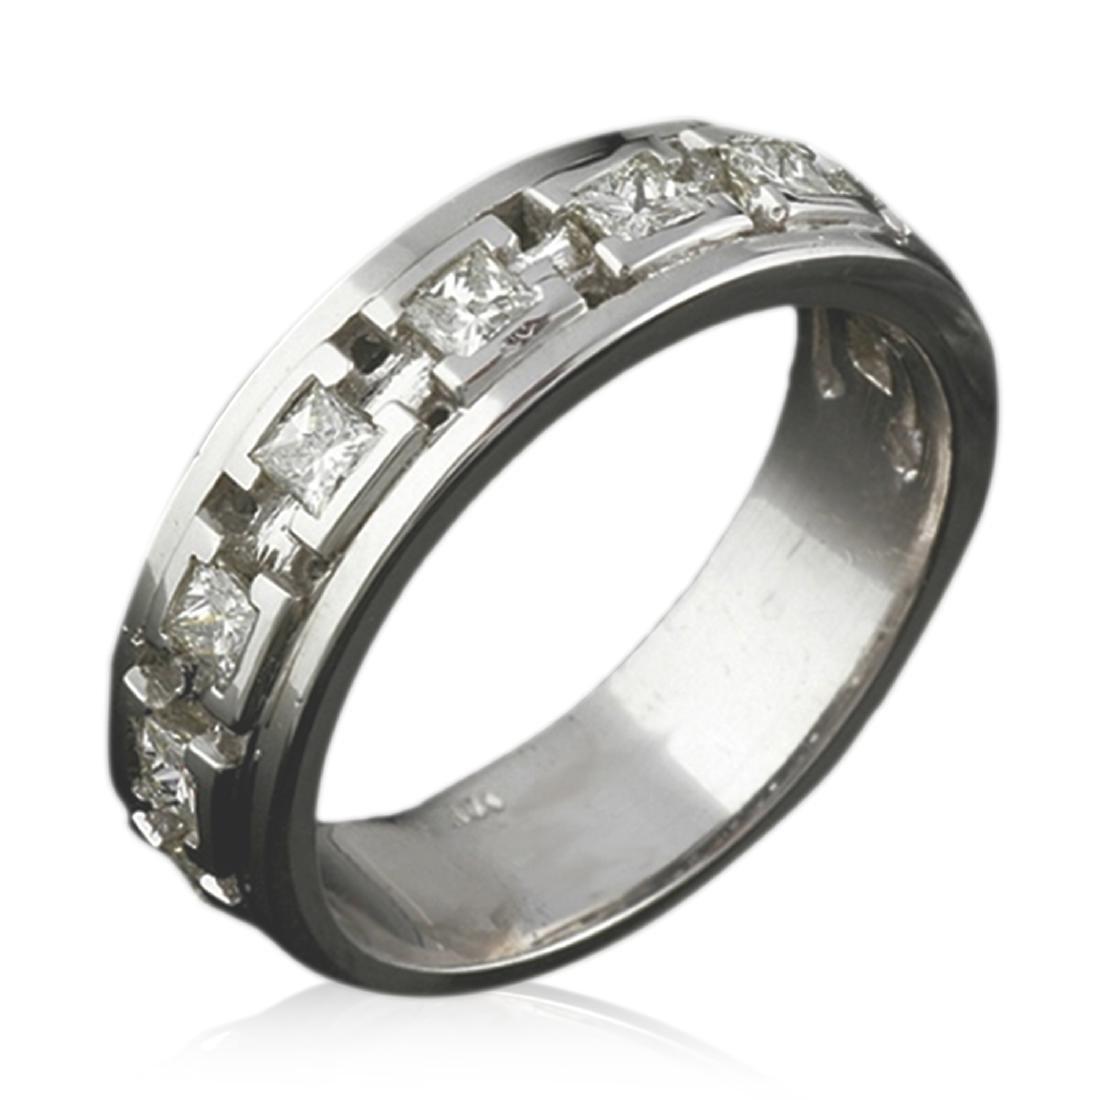 Mens 1.00 Carat Natural Diamond 18K Solid White Gold